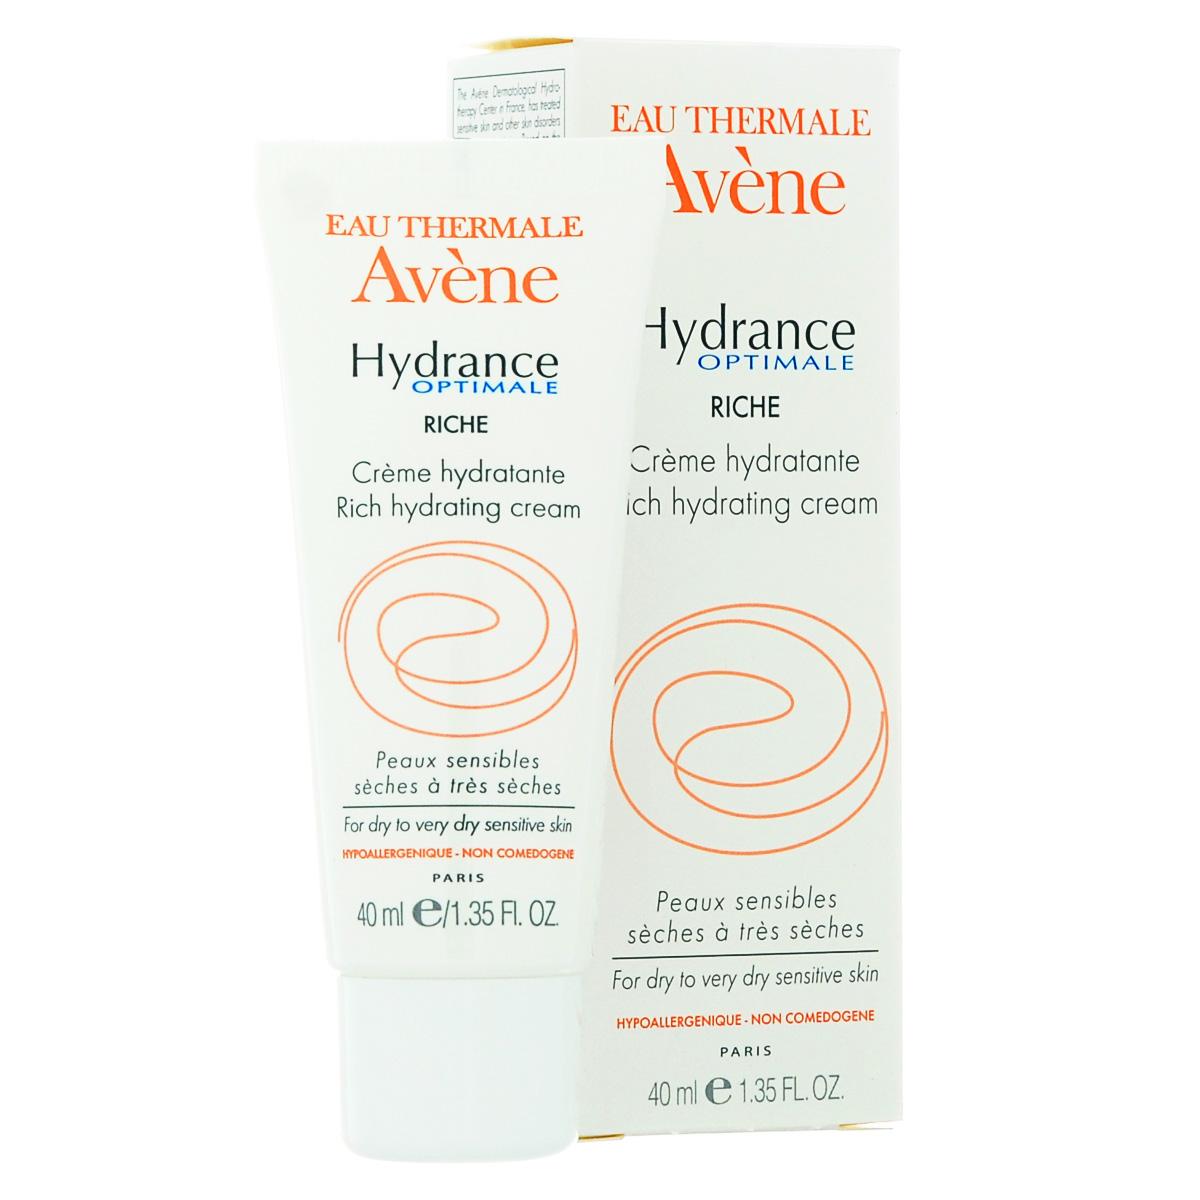 Avene Крем увлажняющий Hydrance ОПТИМАЛЬ РИШ для сухой кожи лица 40мл